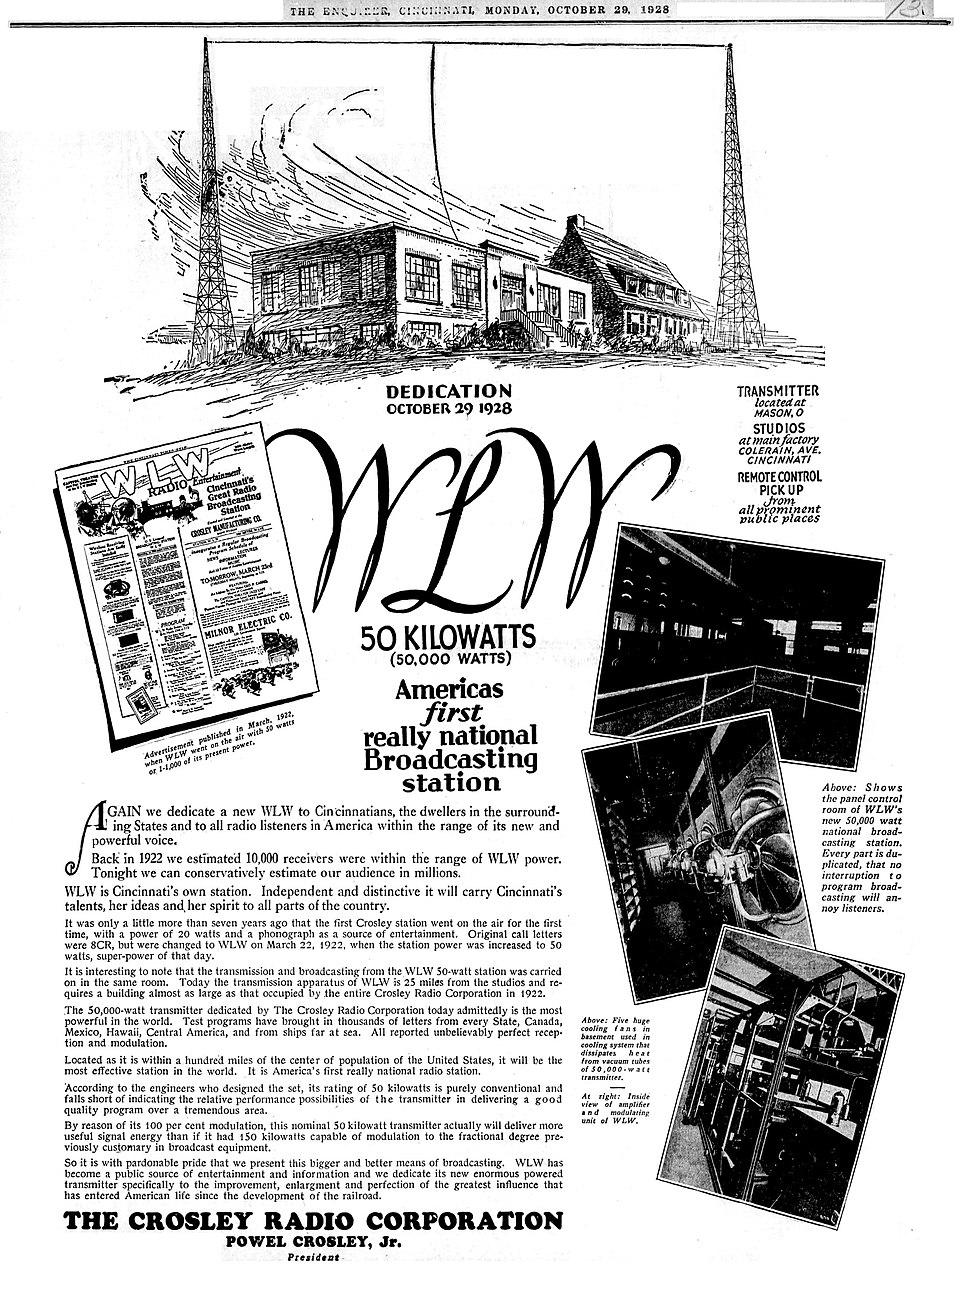 WLW Cincinnati Ohio radio advertisement (1928)